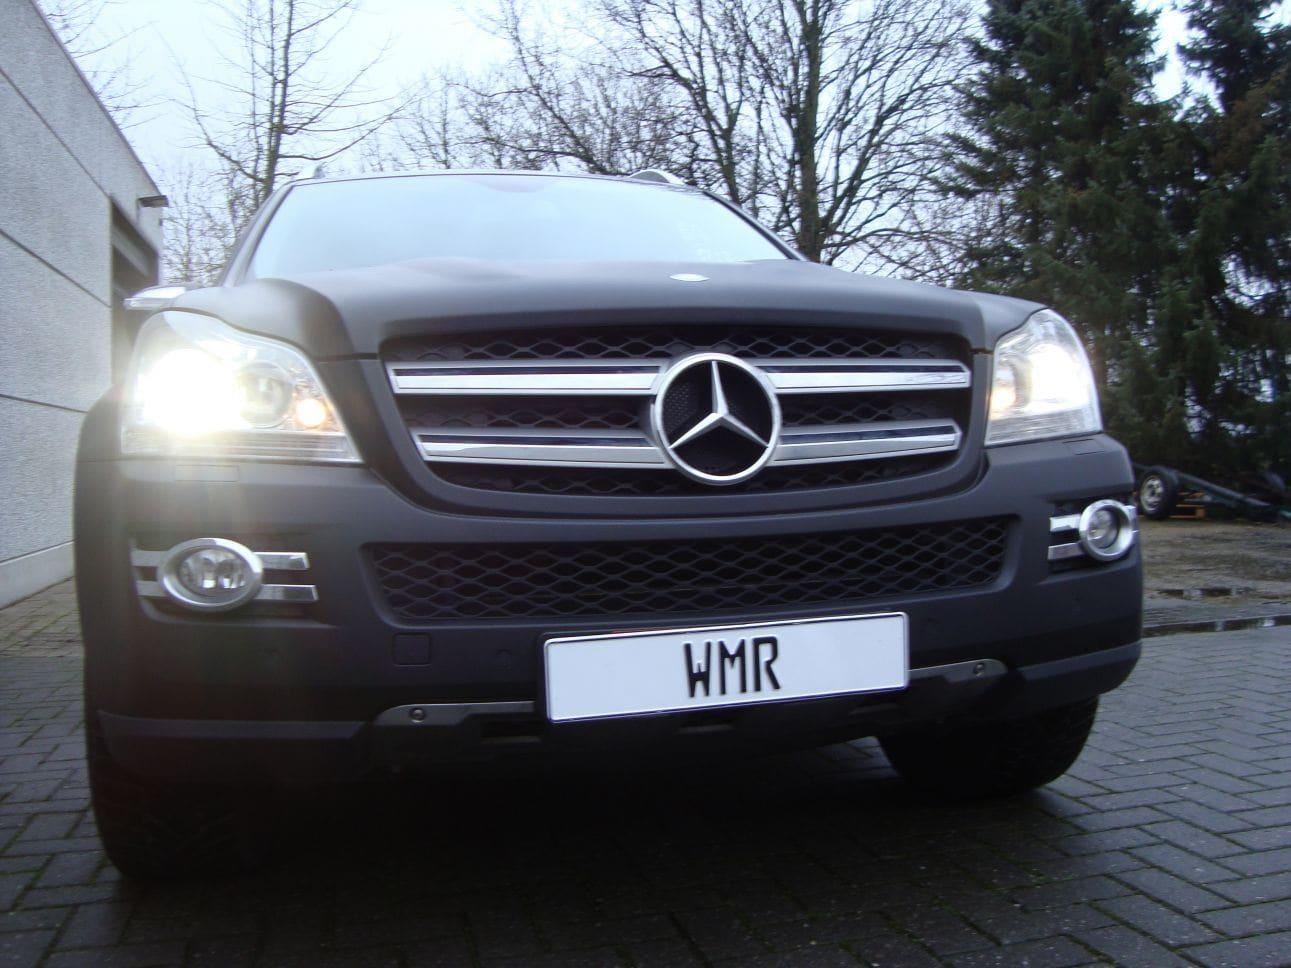 Mercedes GL met Mat Zwarte Wrap, Carwrapping door Wrapmyride.nu Foto-nr:6287, ©2021